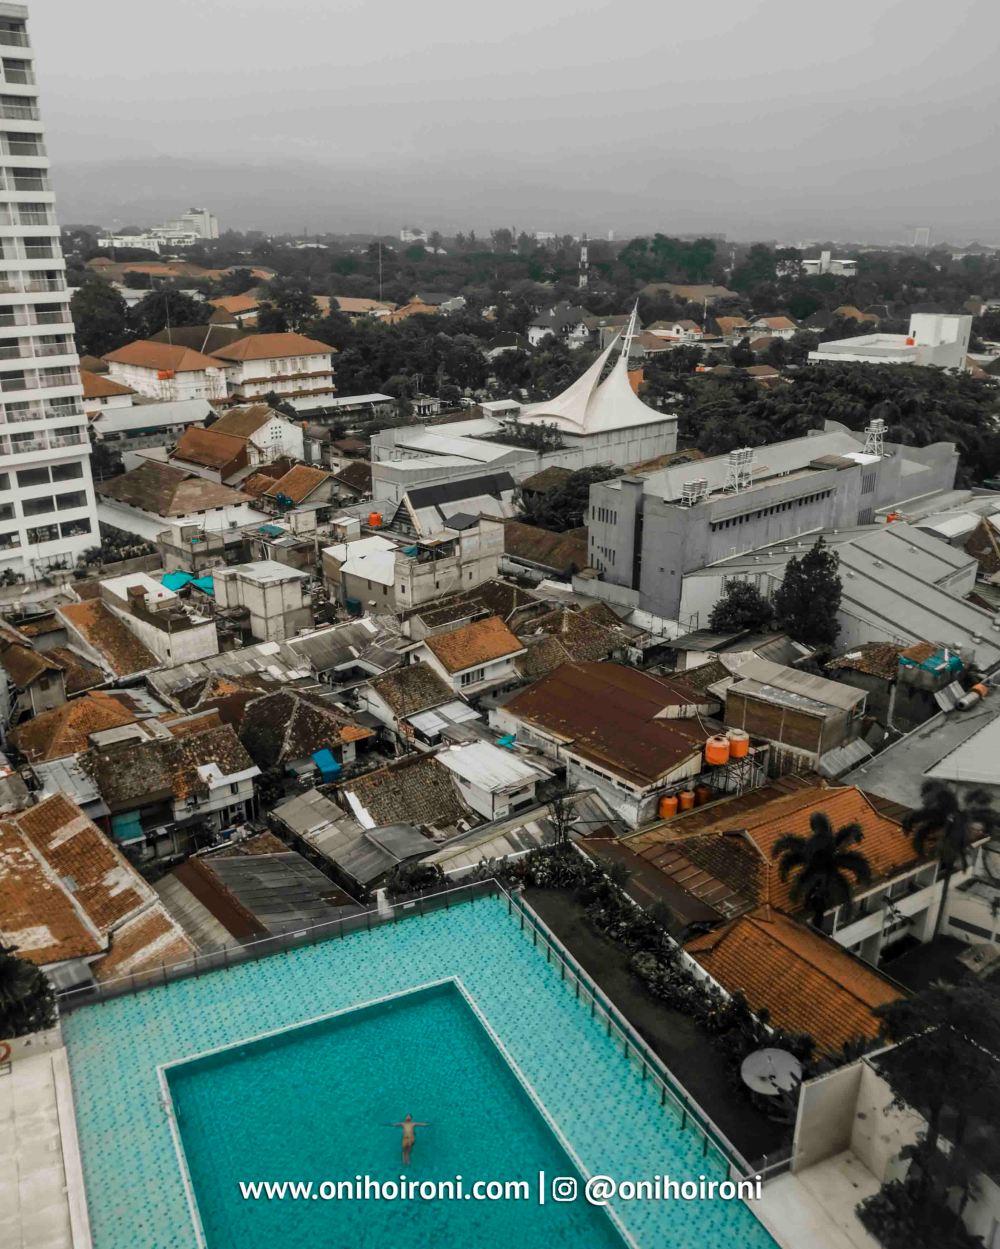 4 Swimming Pool Crowne Plaza Bandung Oni Hoironi